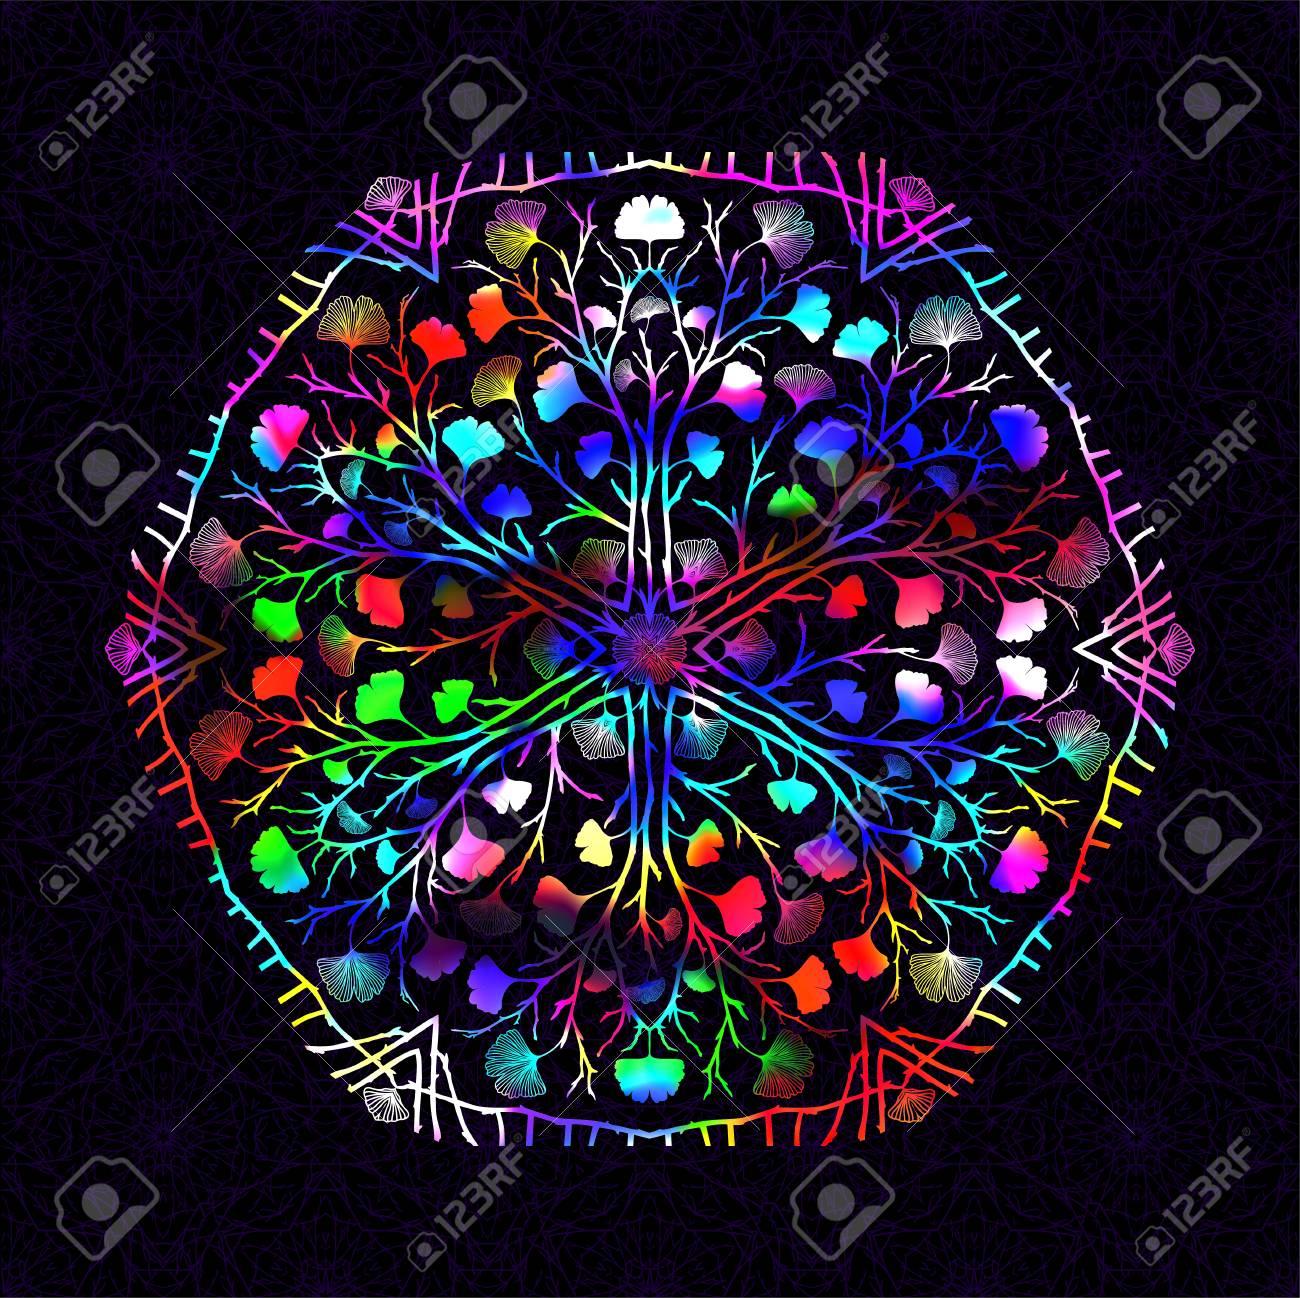 Round Gradient Mandala Vivid Bright Colorful Vibrant Glow ...